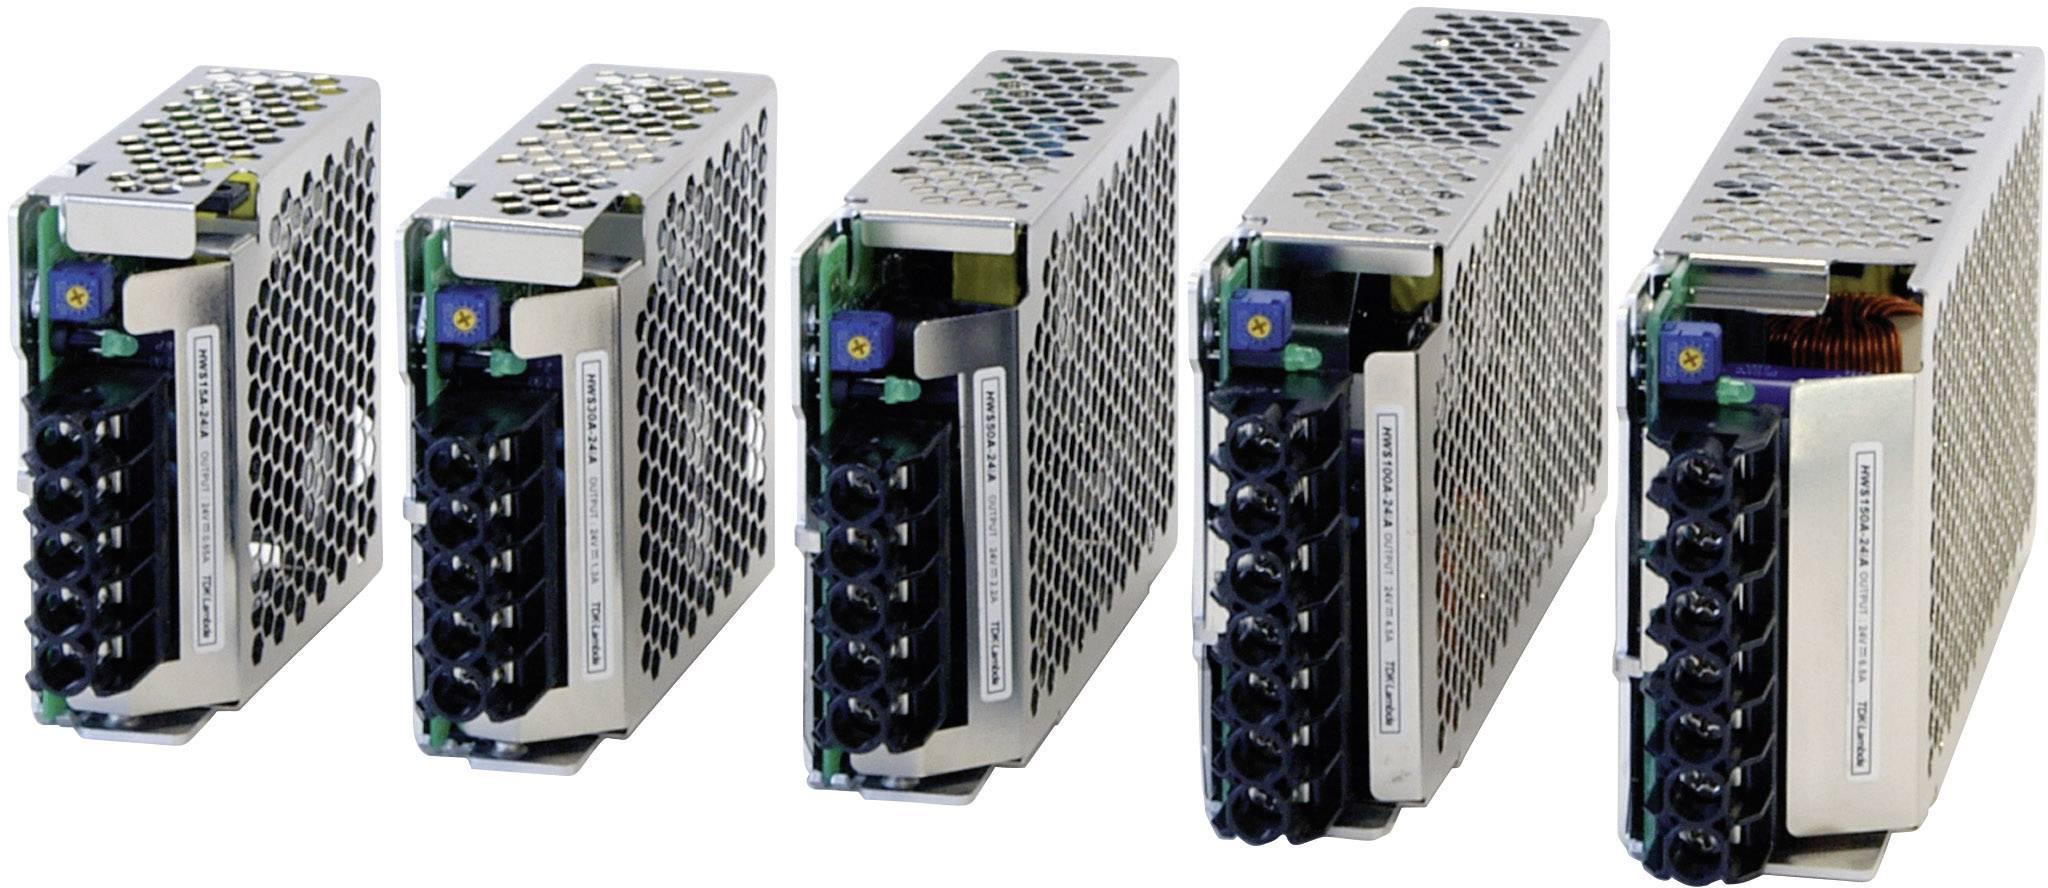 Zabudovateľný napájací zdroj TDK-Lambda HWS-50A-48, 48 V, 52,8 W